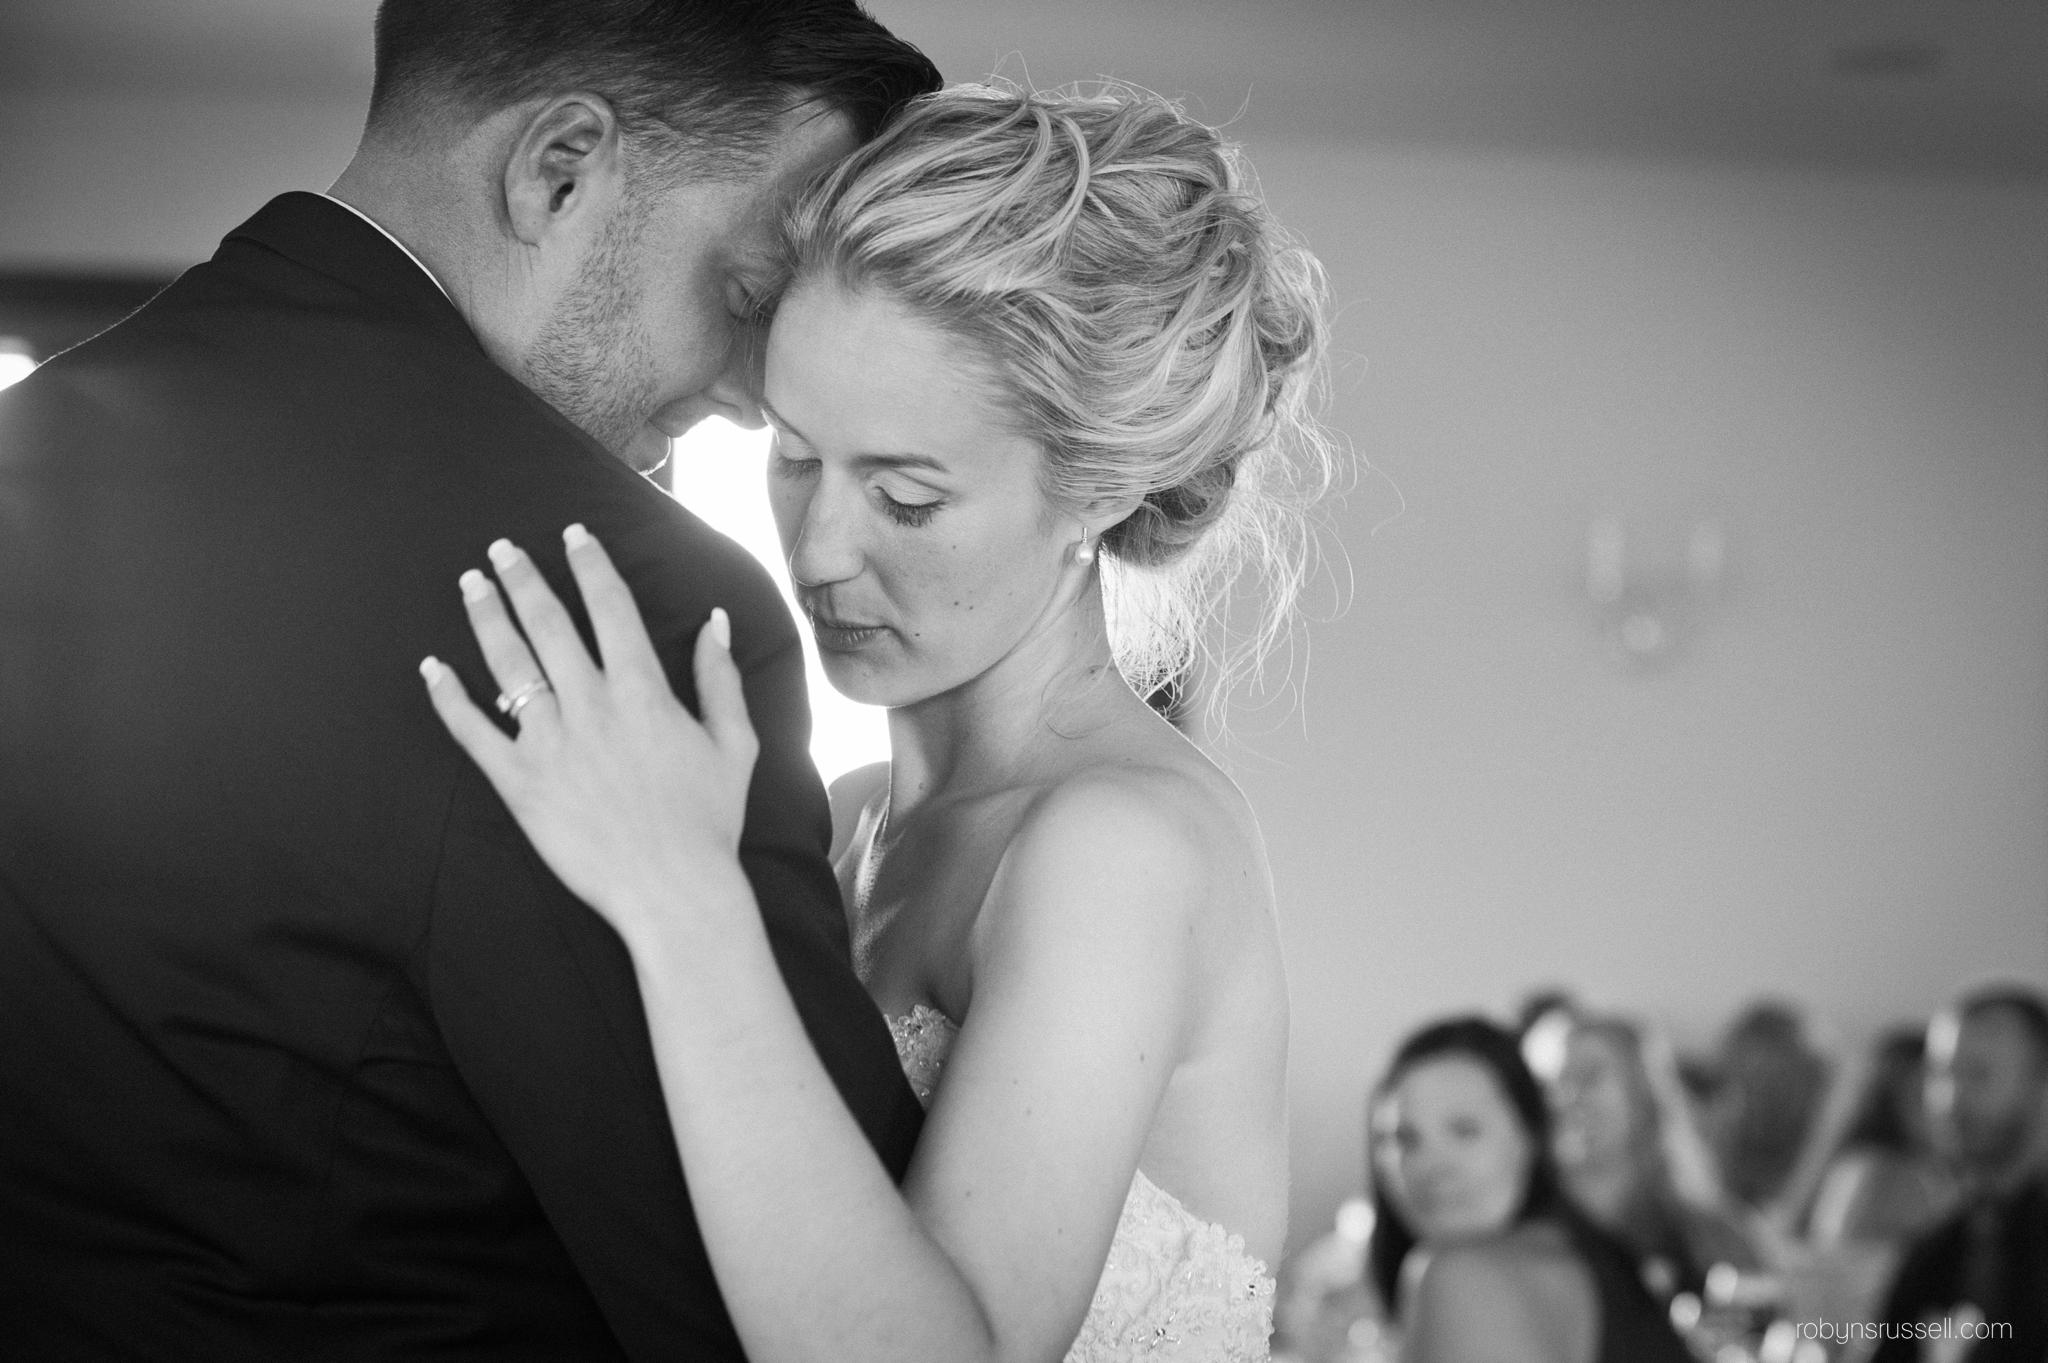 48-bride-and-groom-first-dance-oakville-photographer.jpg